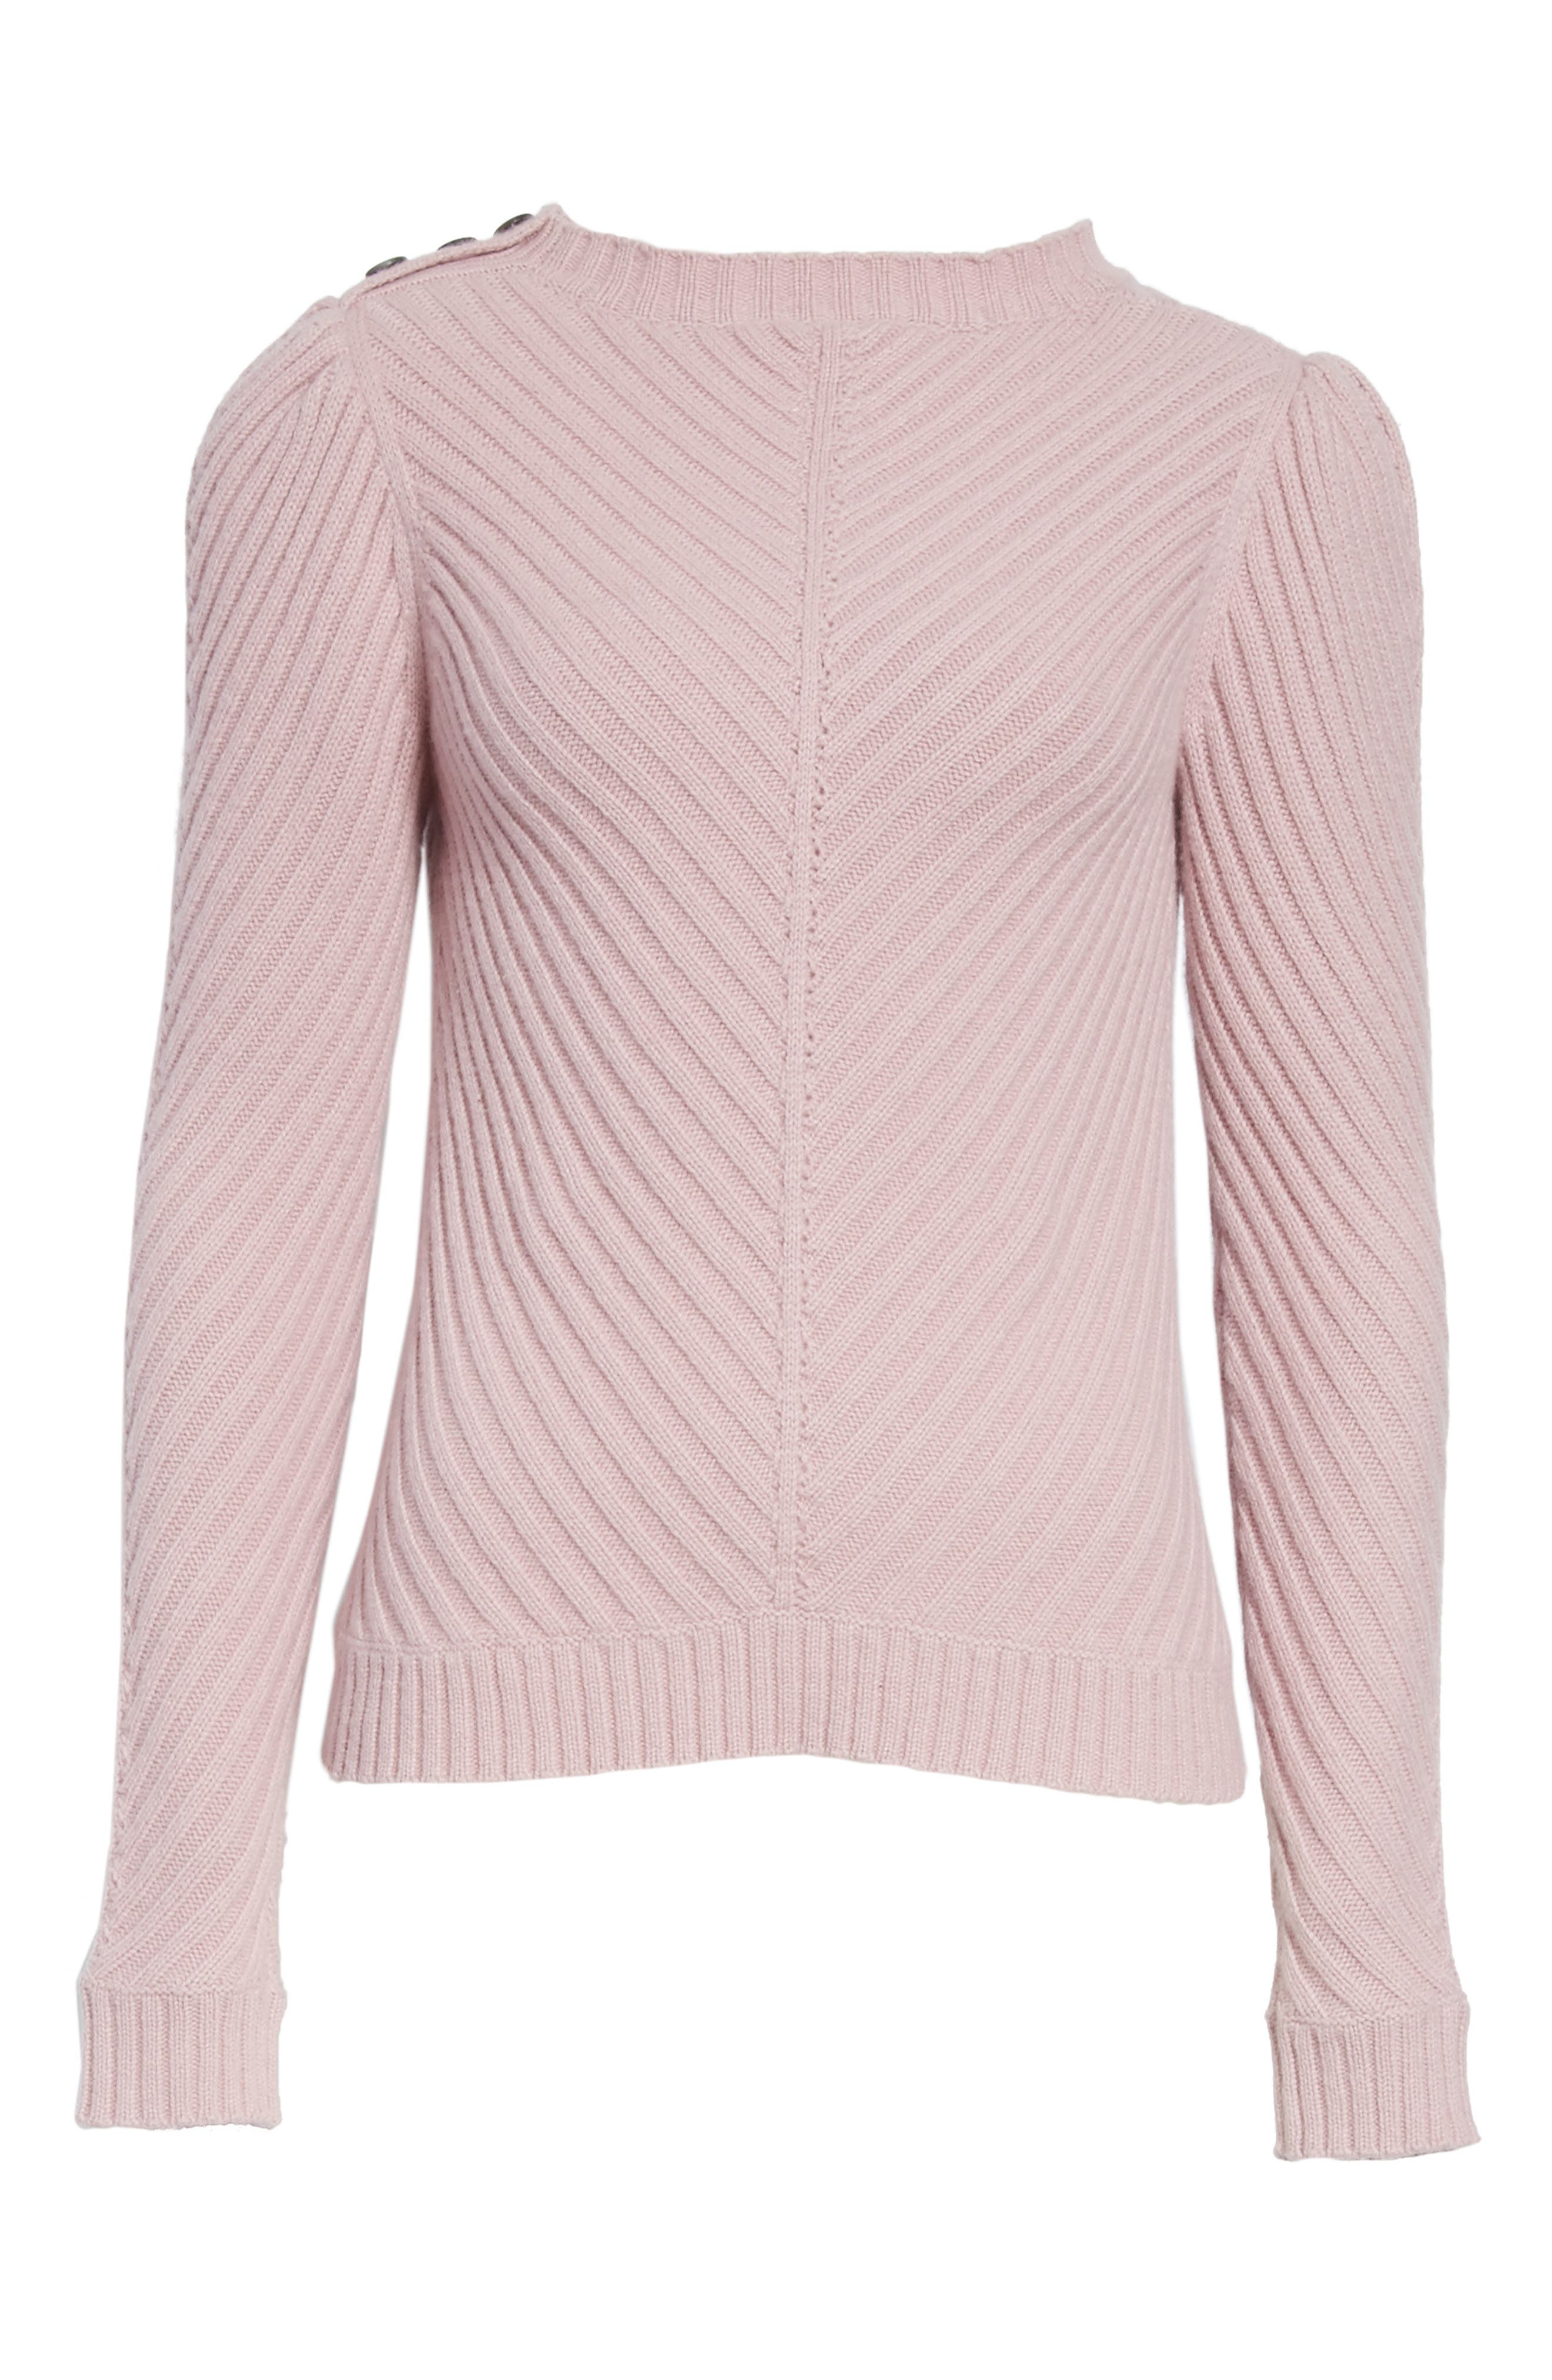 Ribbed Knit Pullover,                             Alternate thumbnail 6, color,                             Mauve